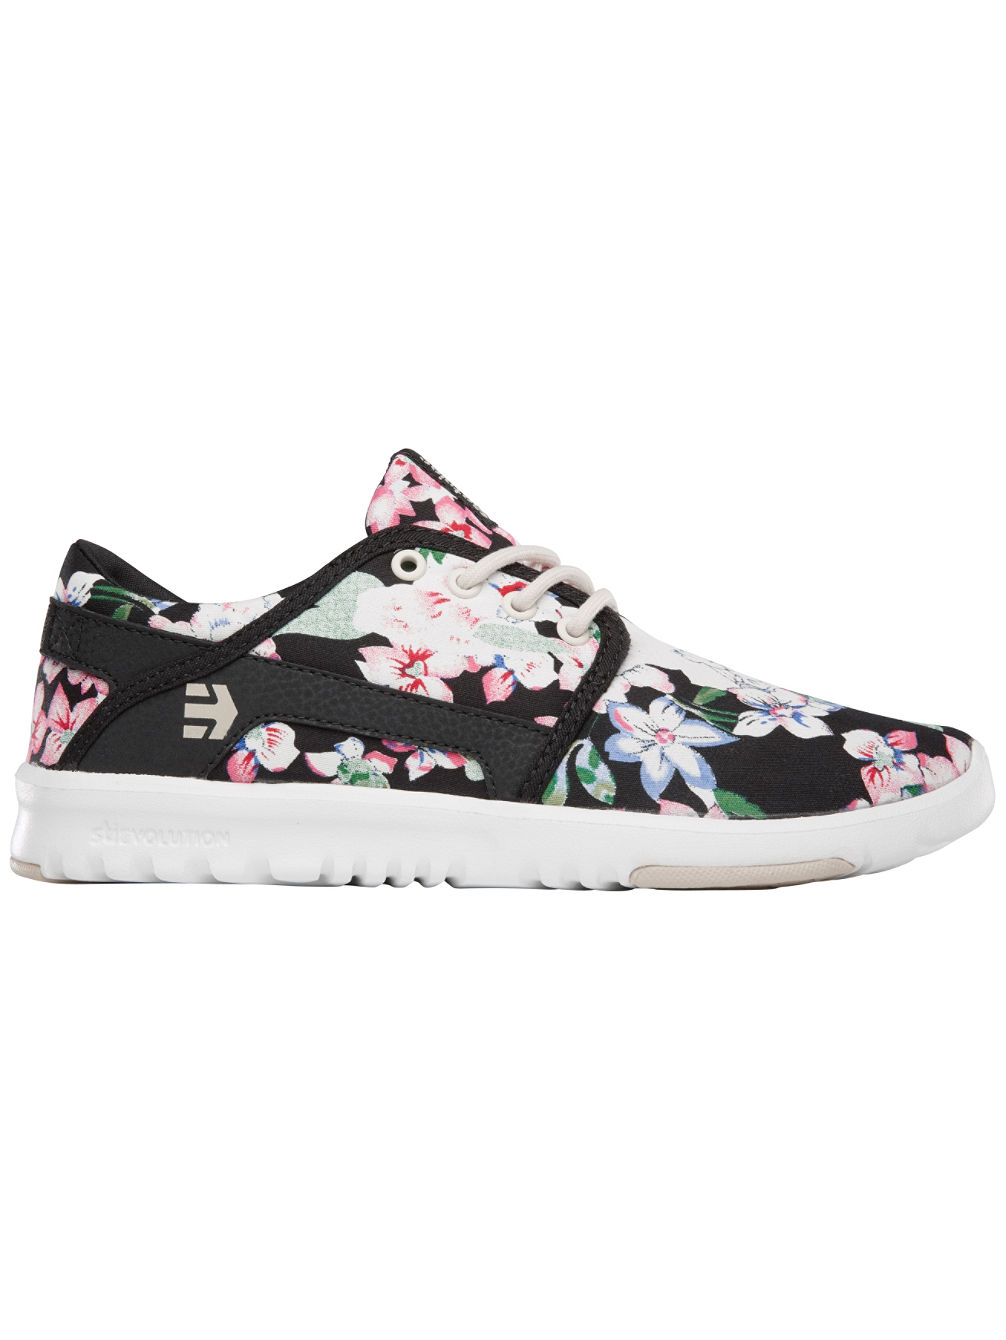 etnies-scout-sneakers-women